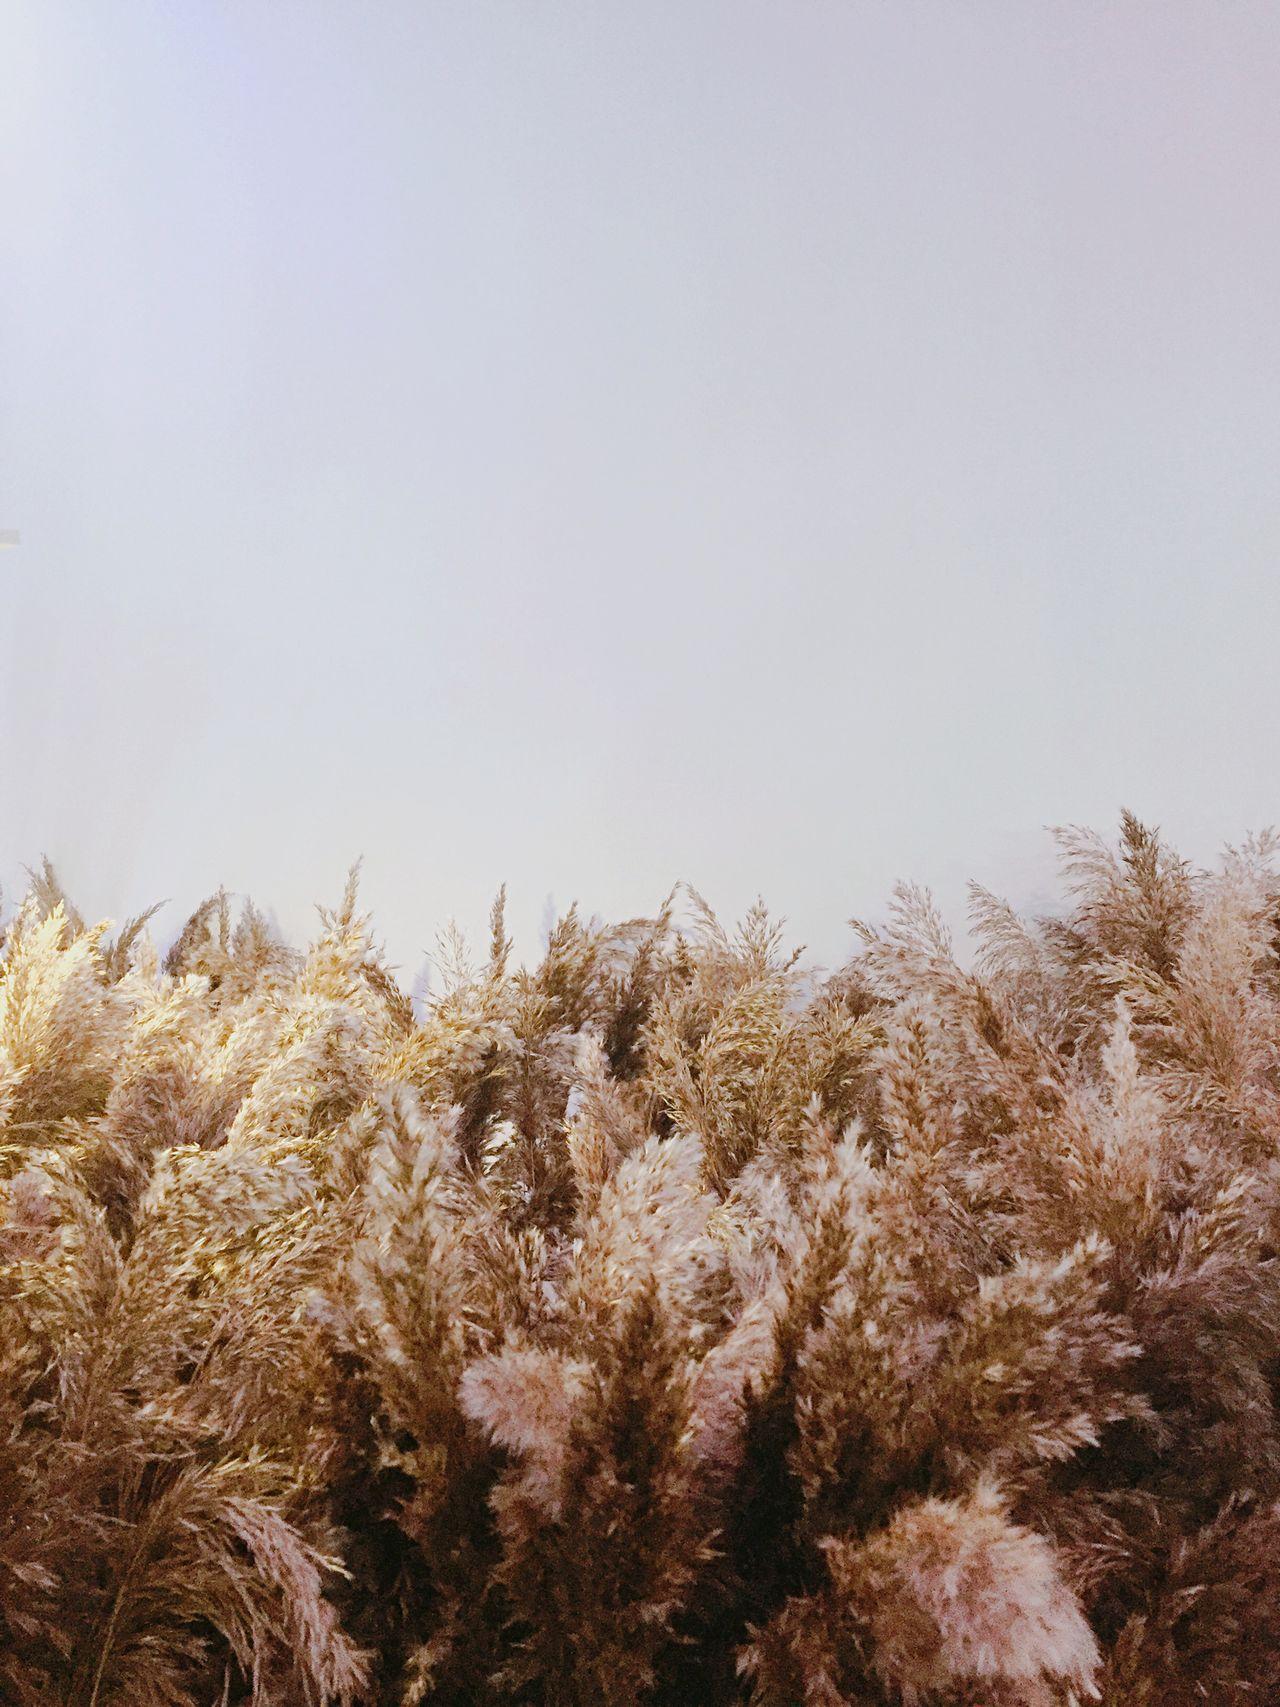 Gentle monster Reeds Minimalism Simplicity IPhoneography